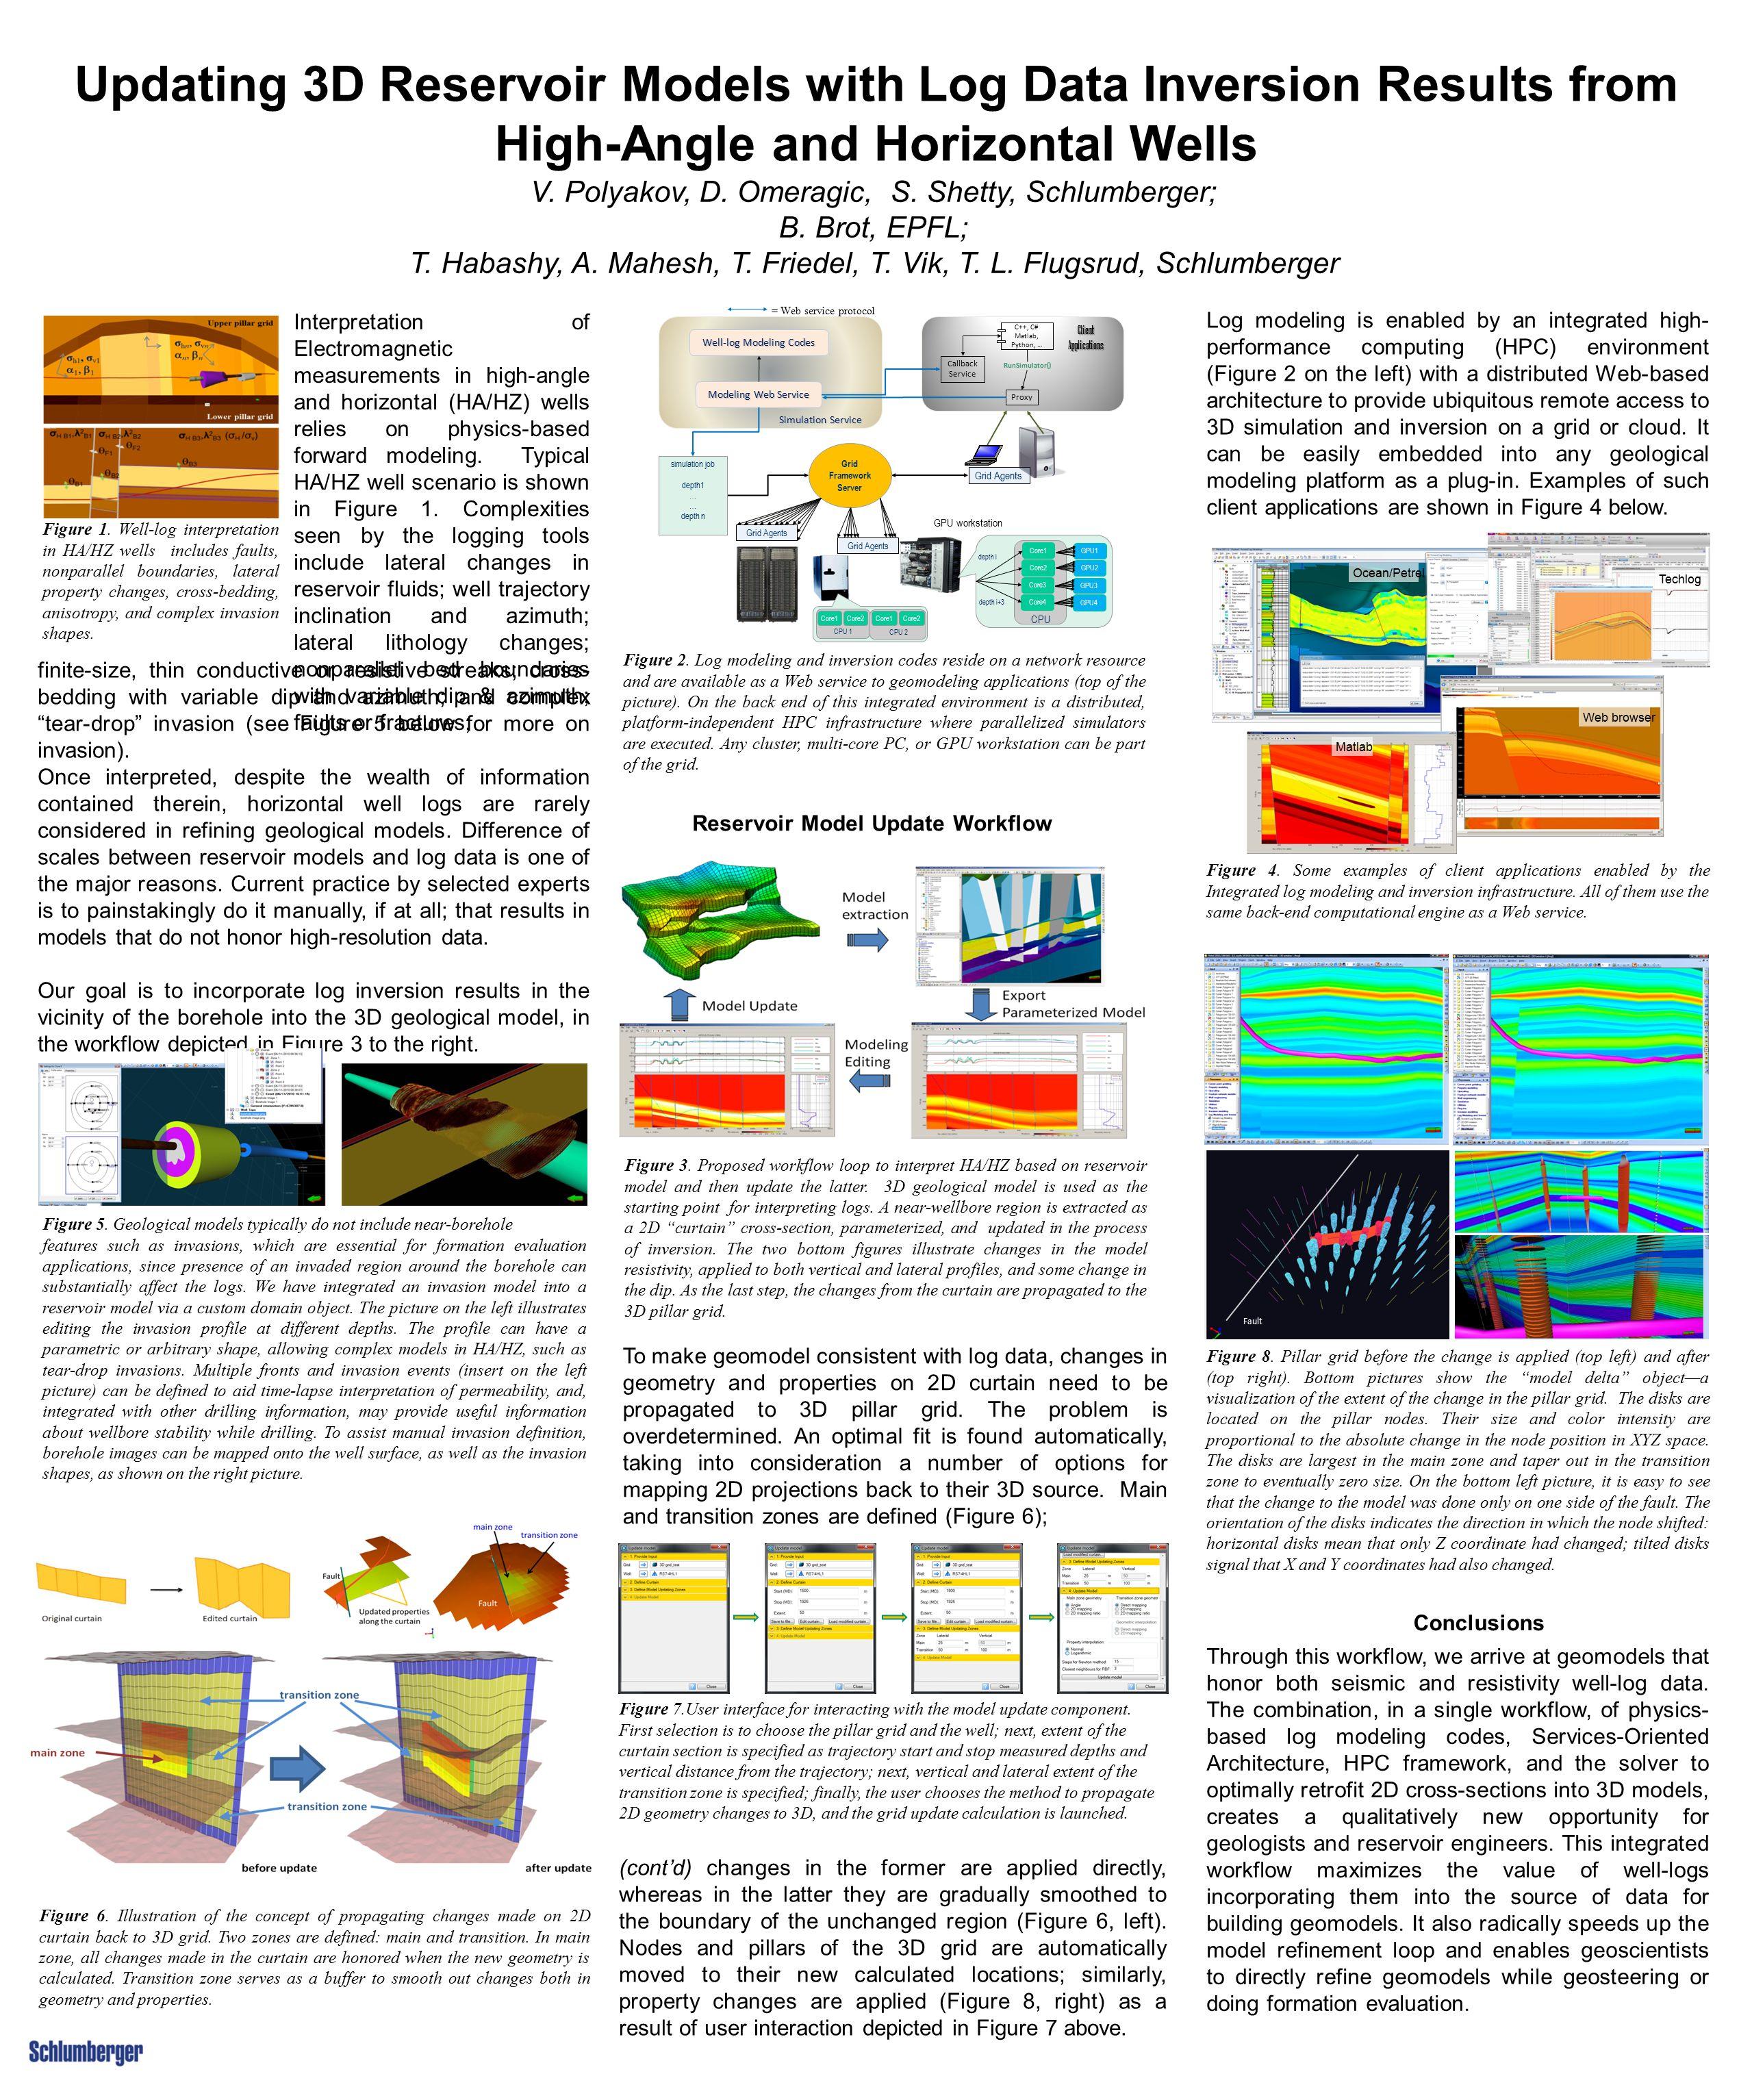 Updating 3D Reservoir Models with Log Data Inversion Results